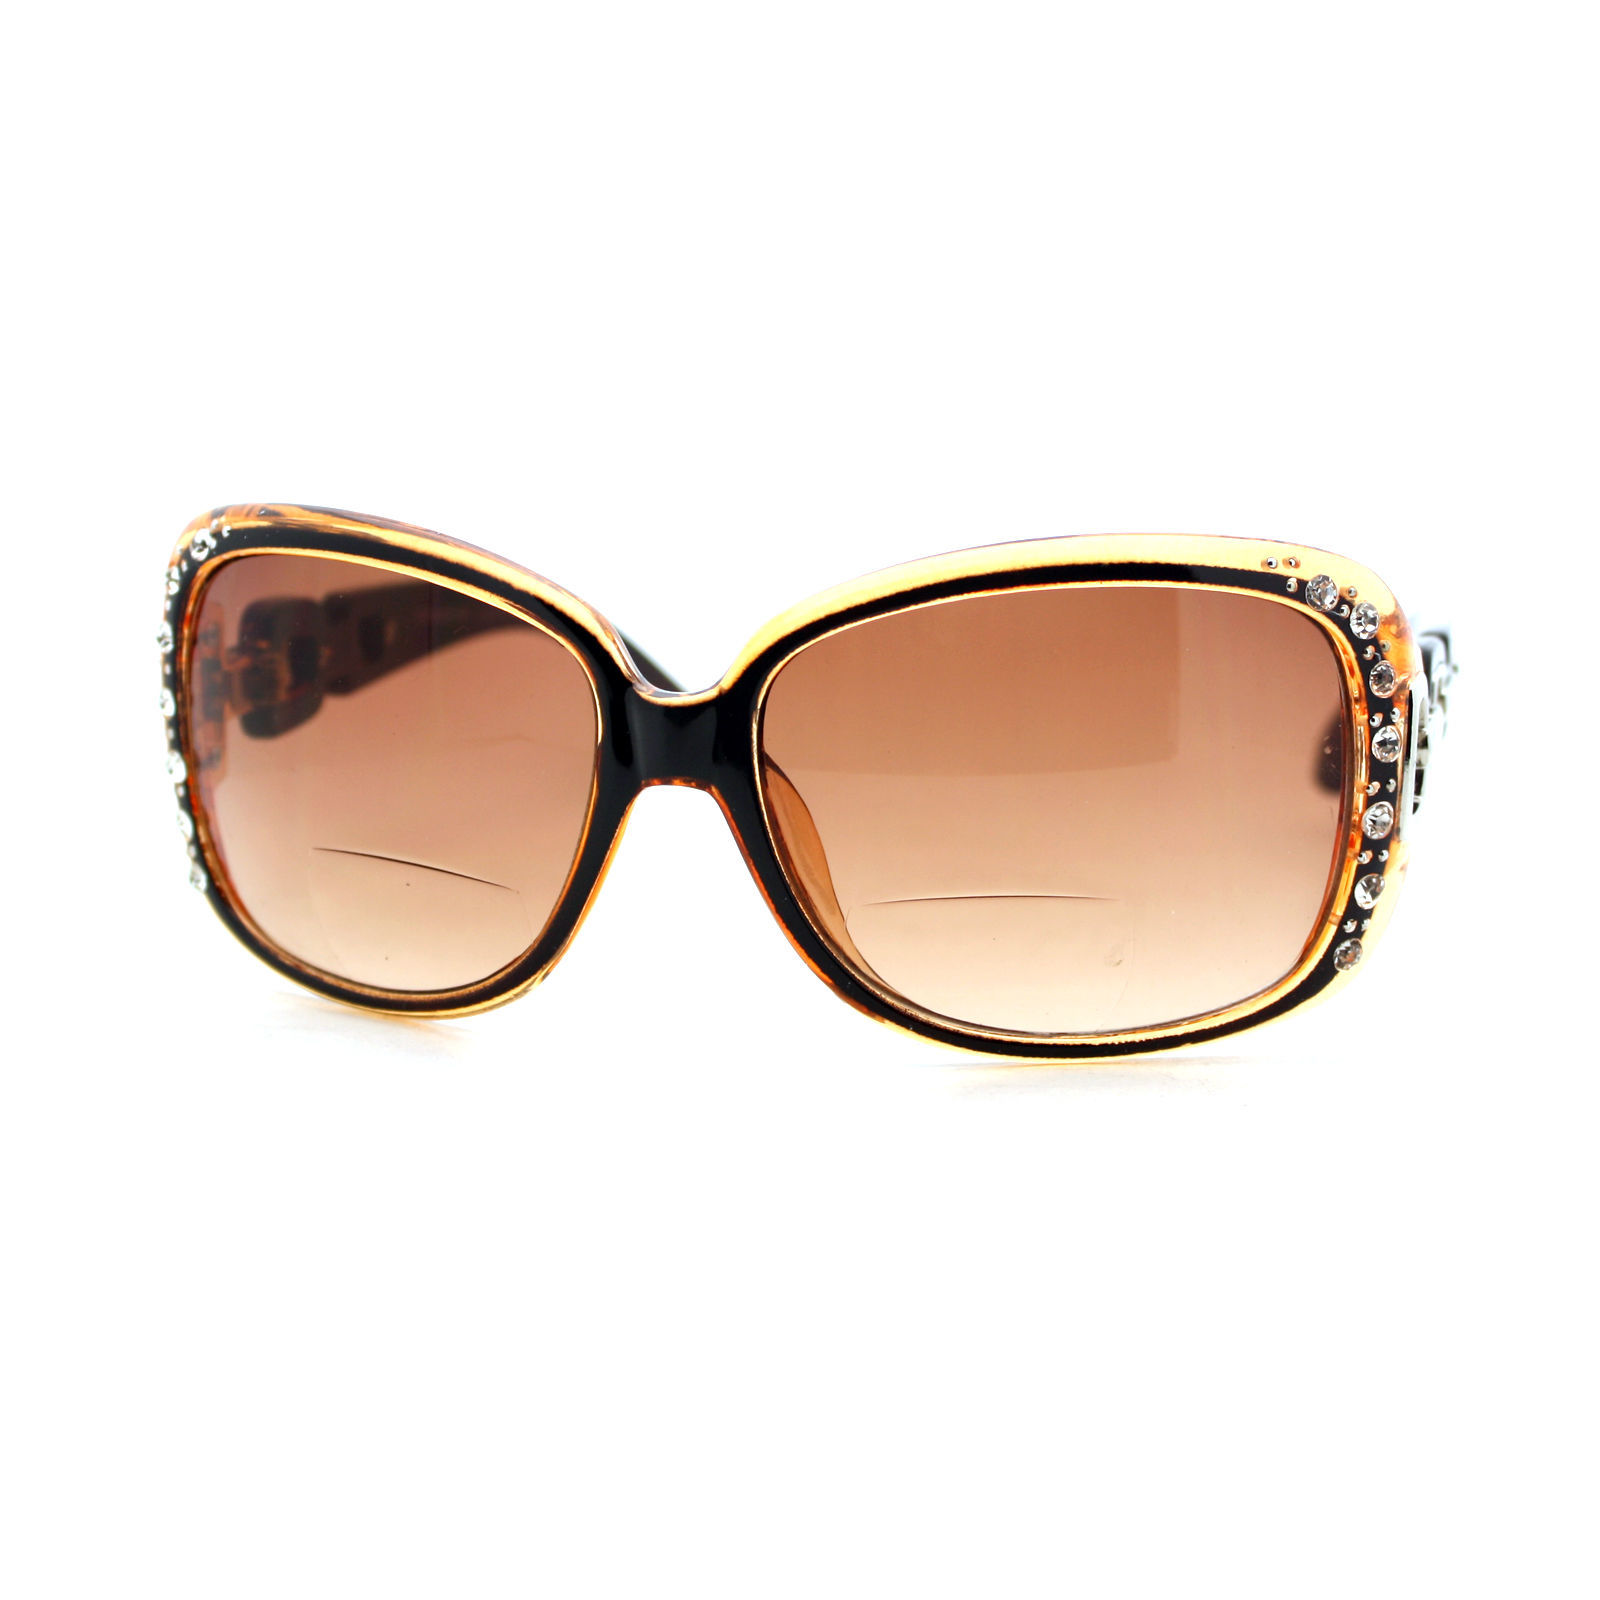 9.95$  Watch now - http://viinb.justgood.pw/vig/item.php?t=8ioqk41671 - Womens Bifocal Lens Sunglasses Oversized Square Rhinestone Frame